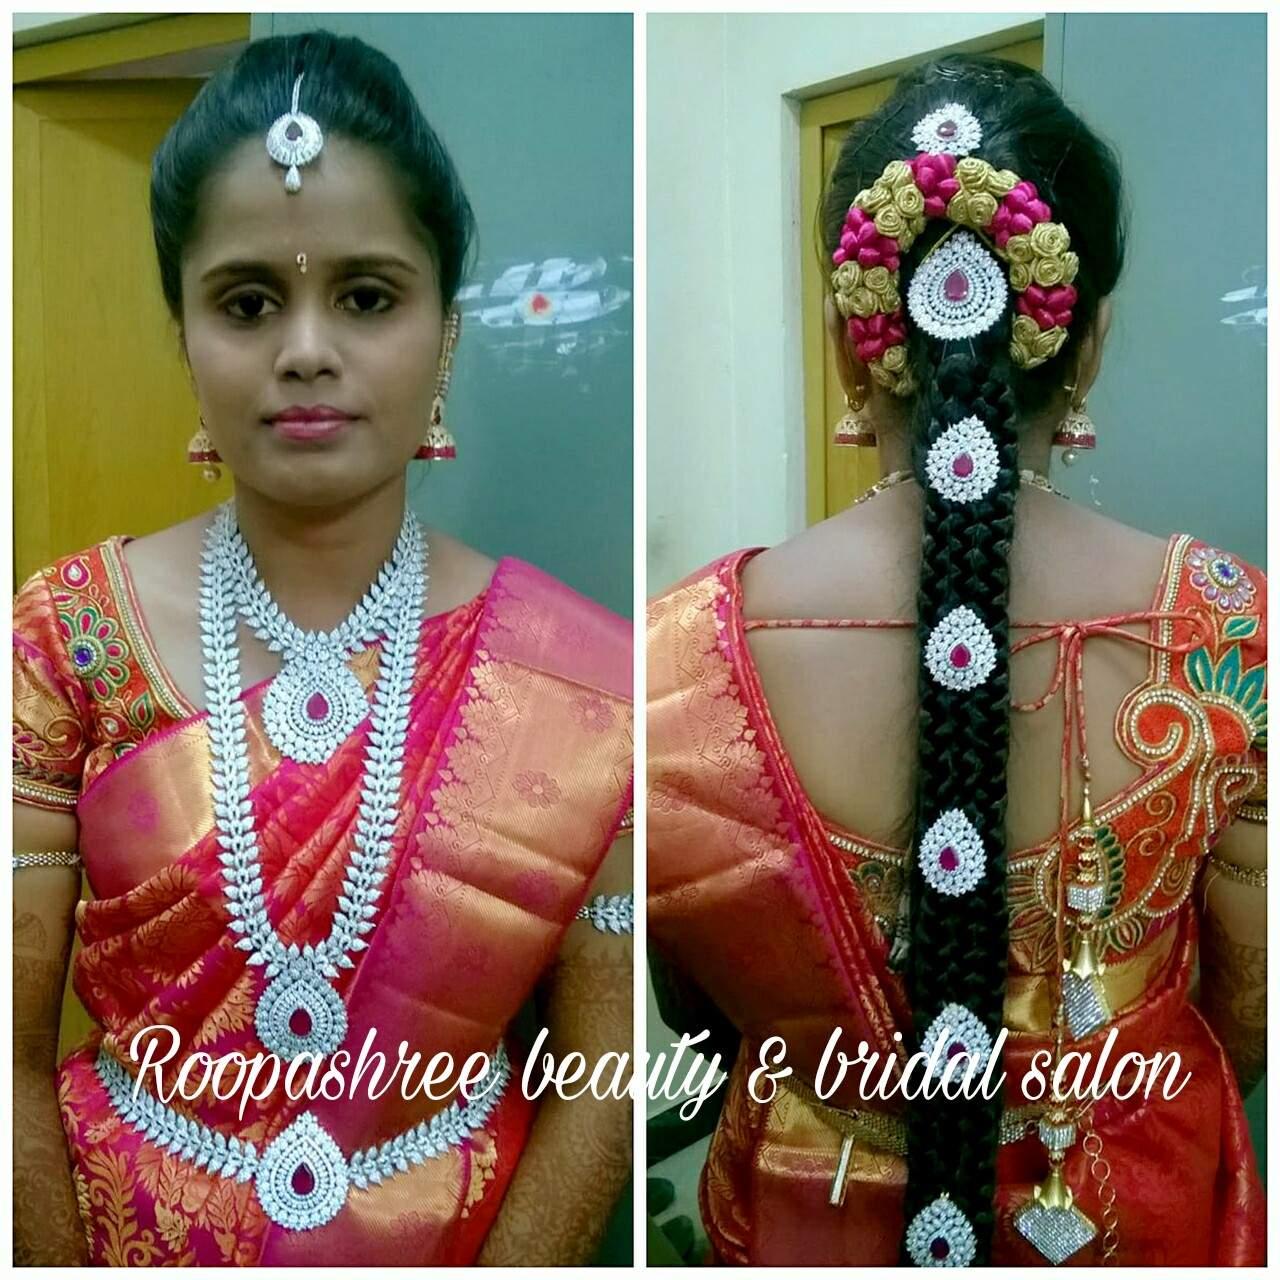 Roopashree Beauty And Bridal Salon Tirupur East Beauty Parlours In Tirupur Justdial